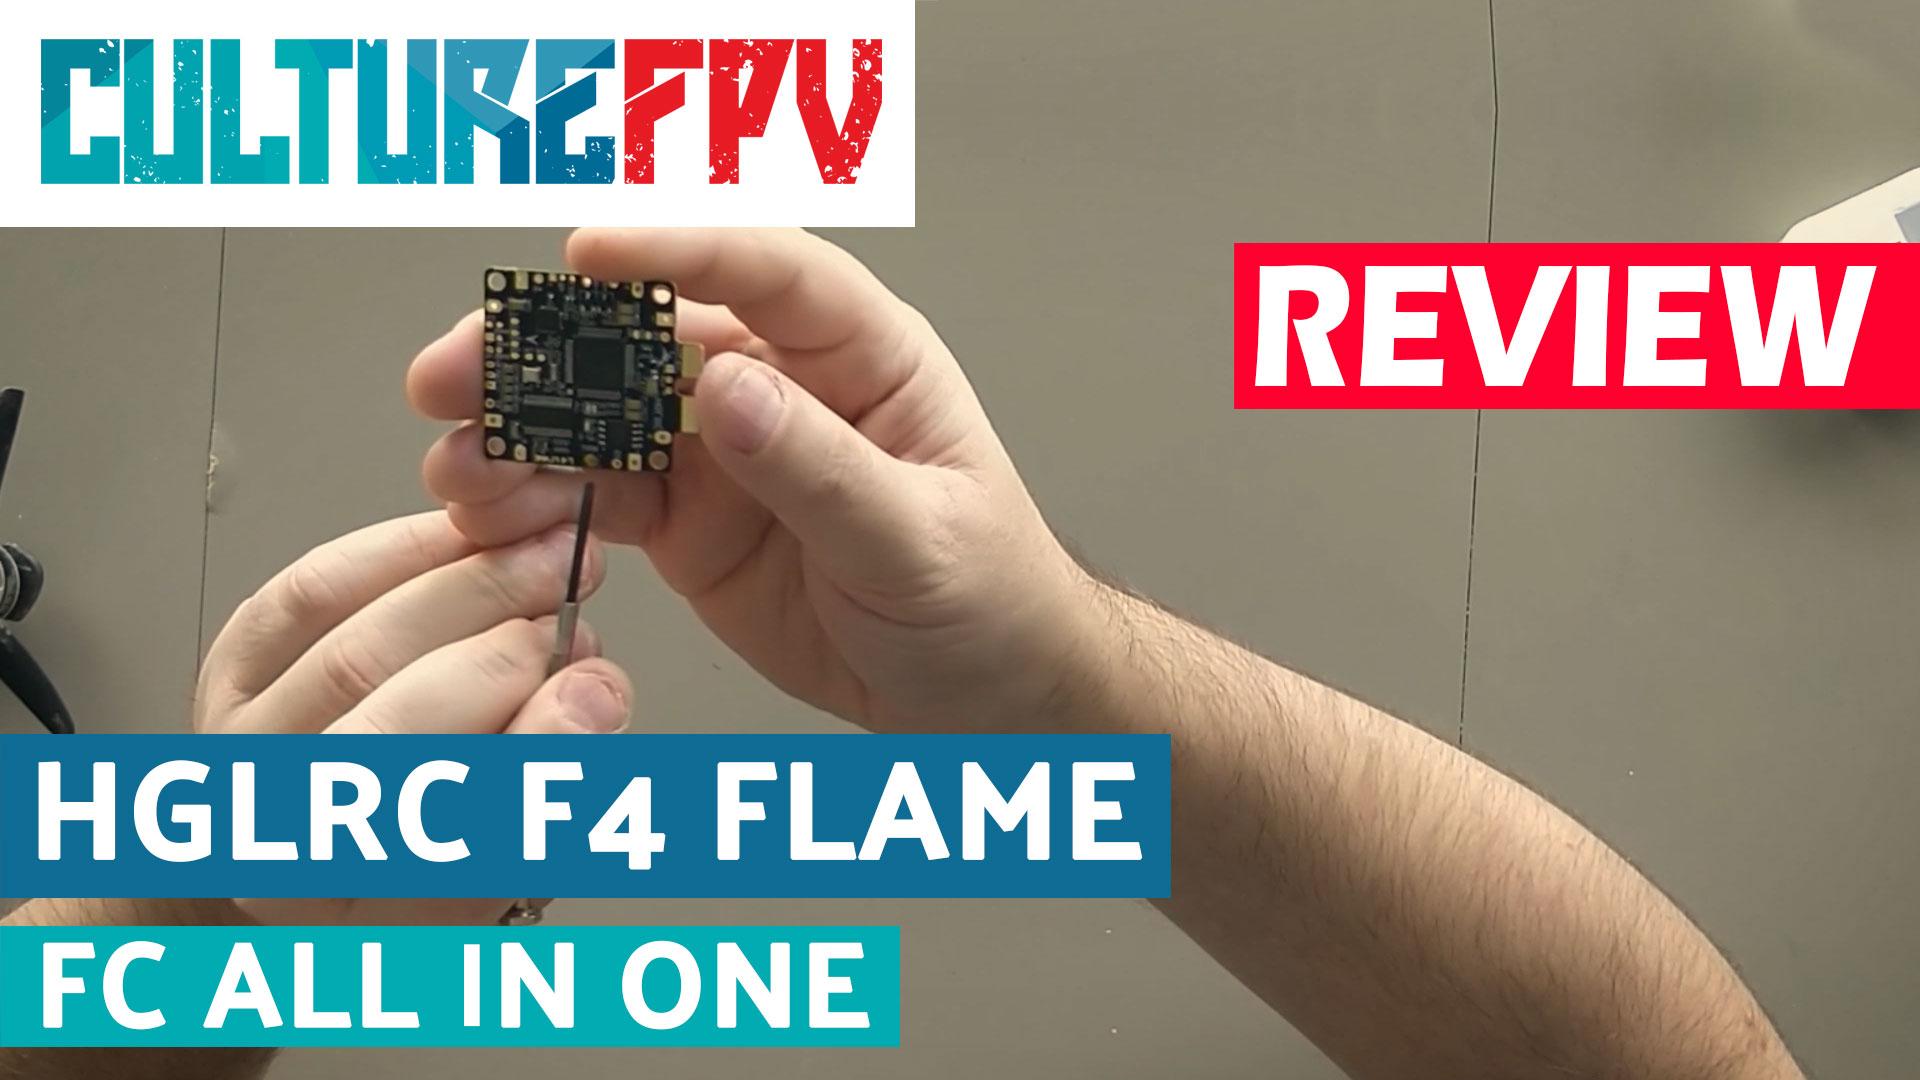 HGLRC F4 Flame